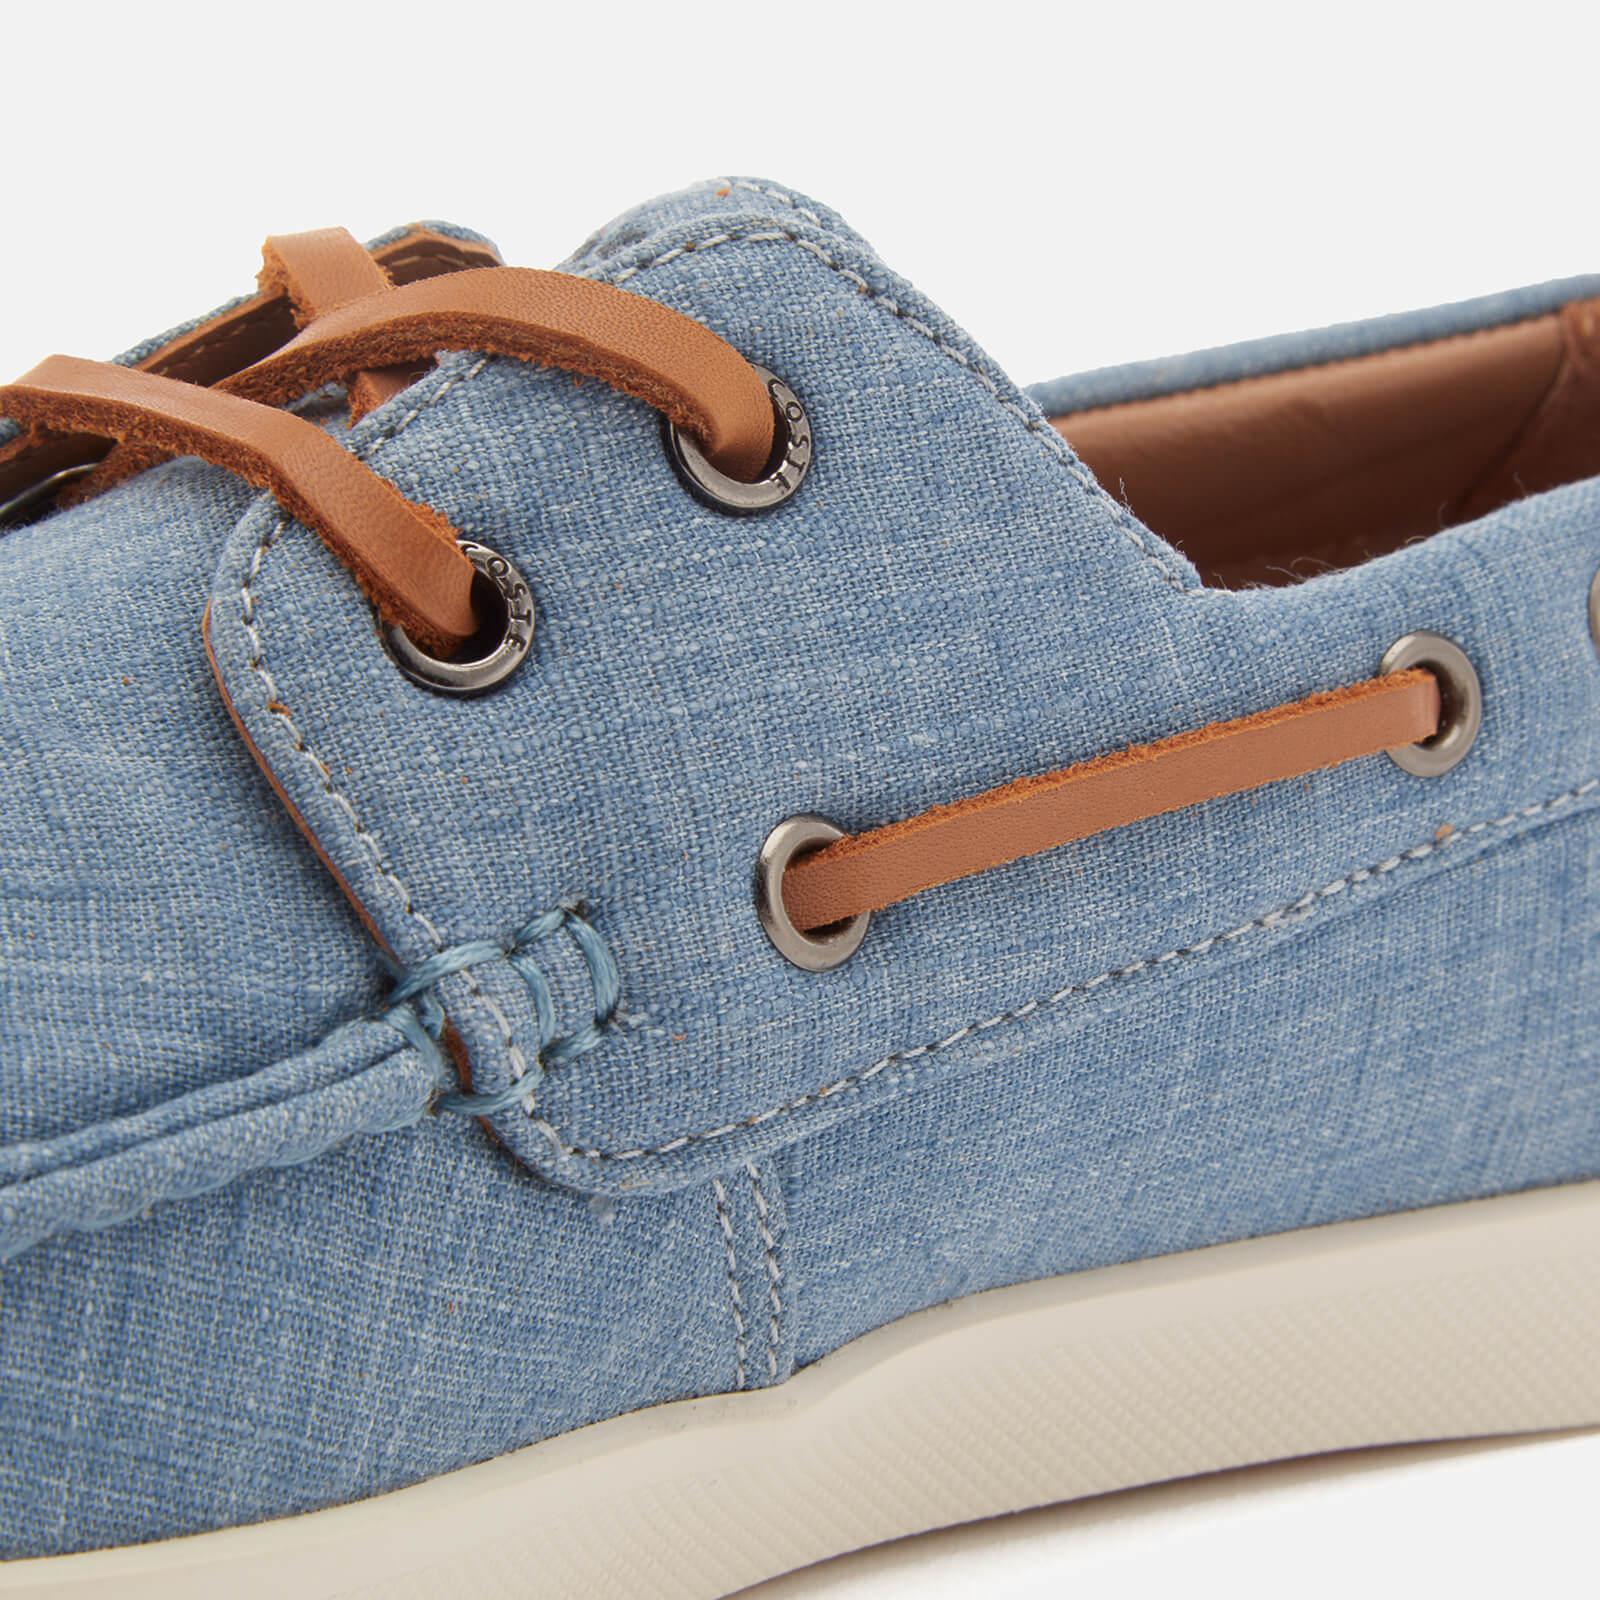 cc55f54cfeb2 Lacoste Keellson Boat Shoes in Blue for Men - Lyst